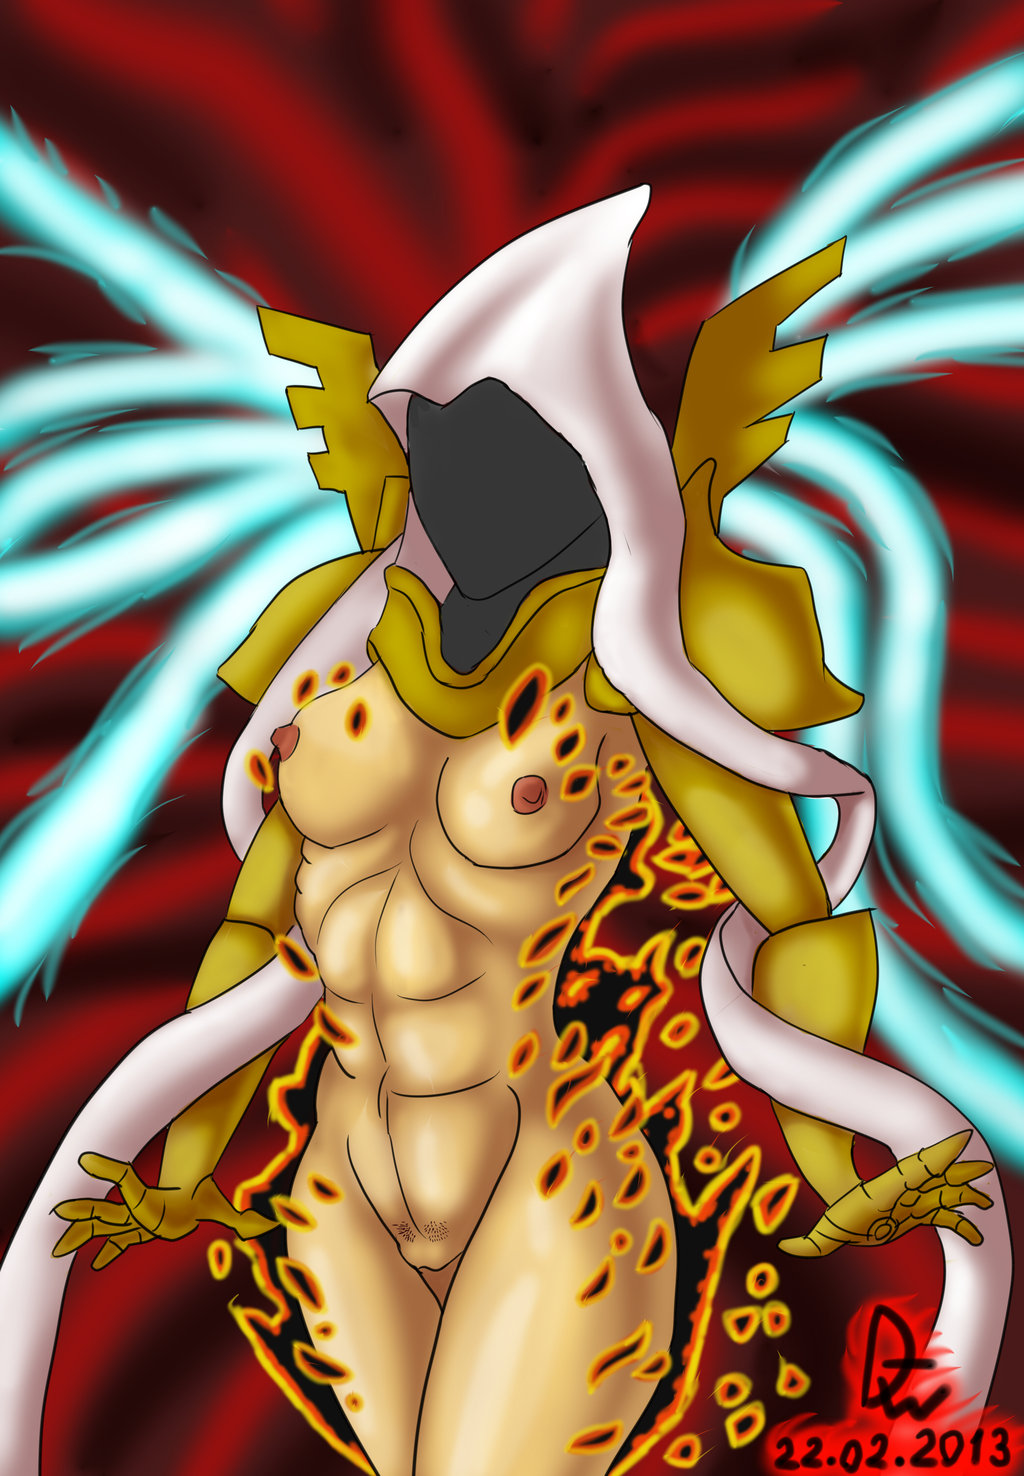 Diablo 3 hentia adult clips